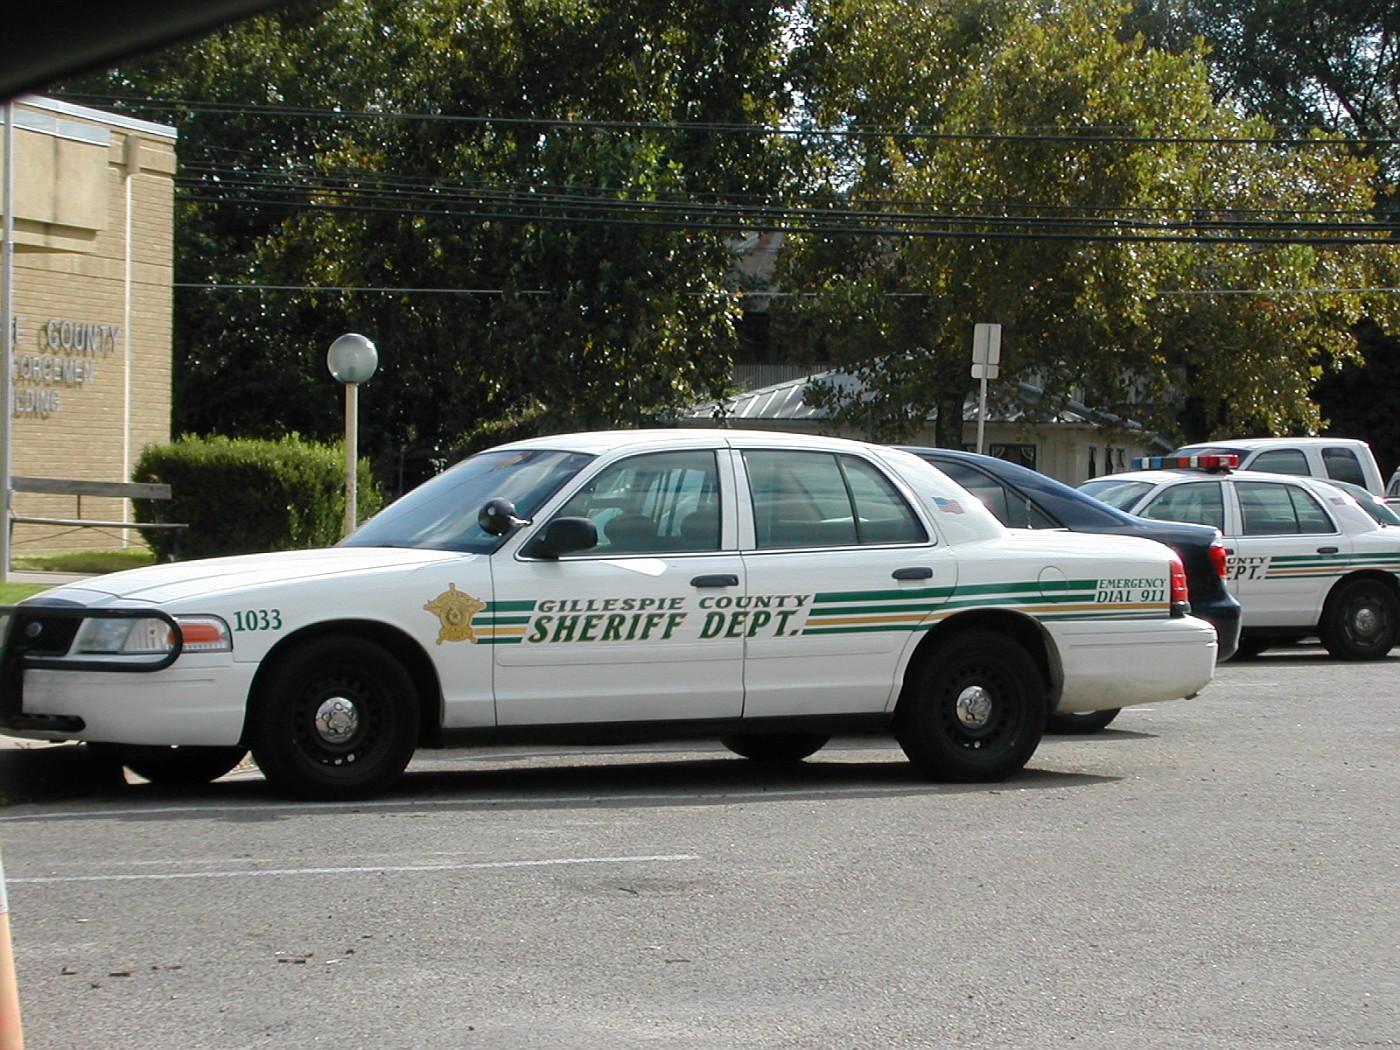 TX - Gillespie County Sheriff